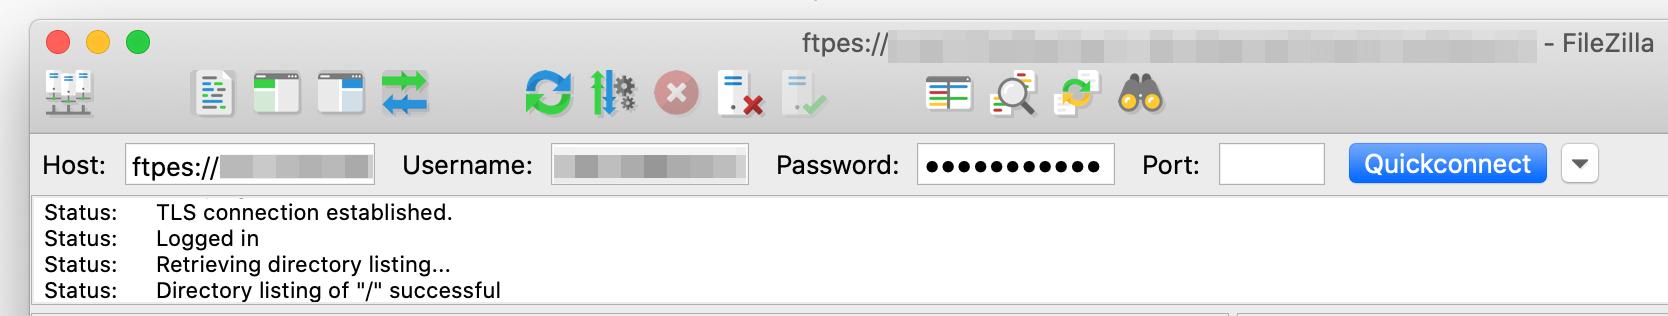 Connect to server via FileZilla